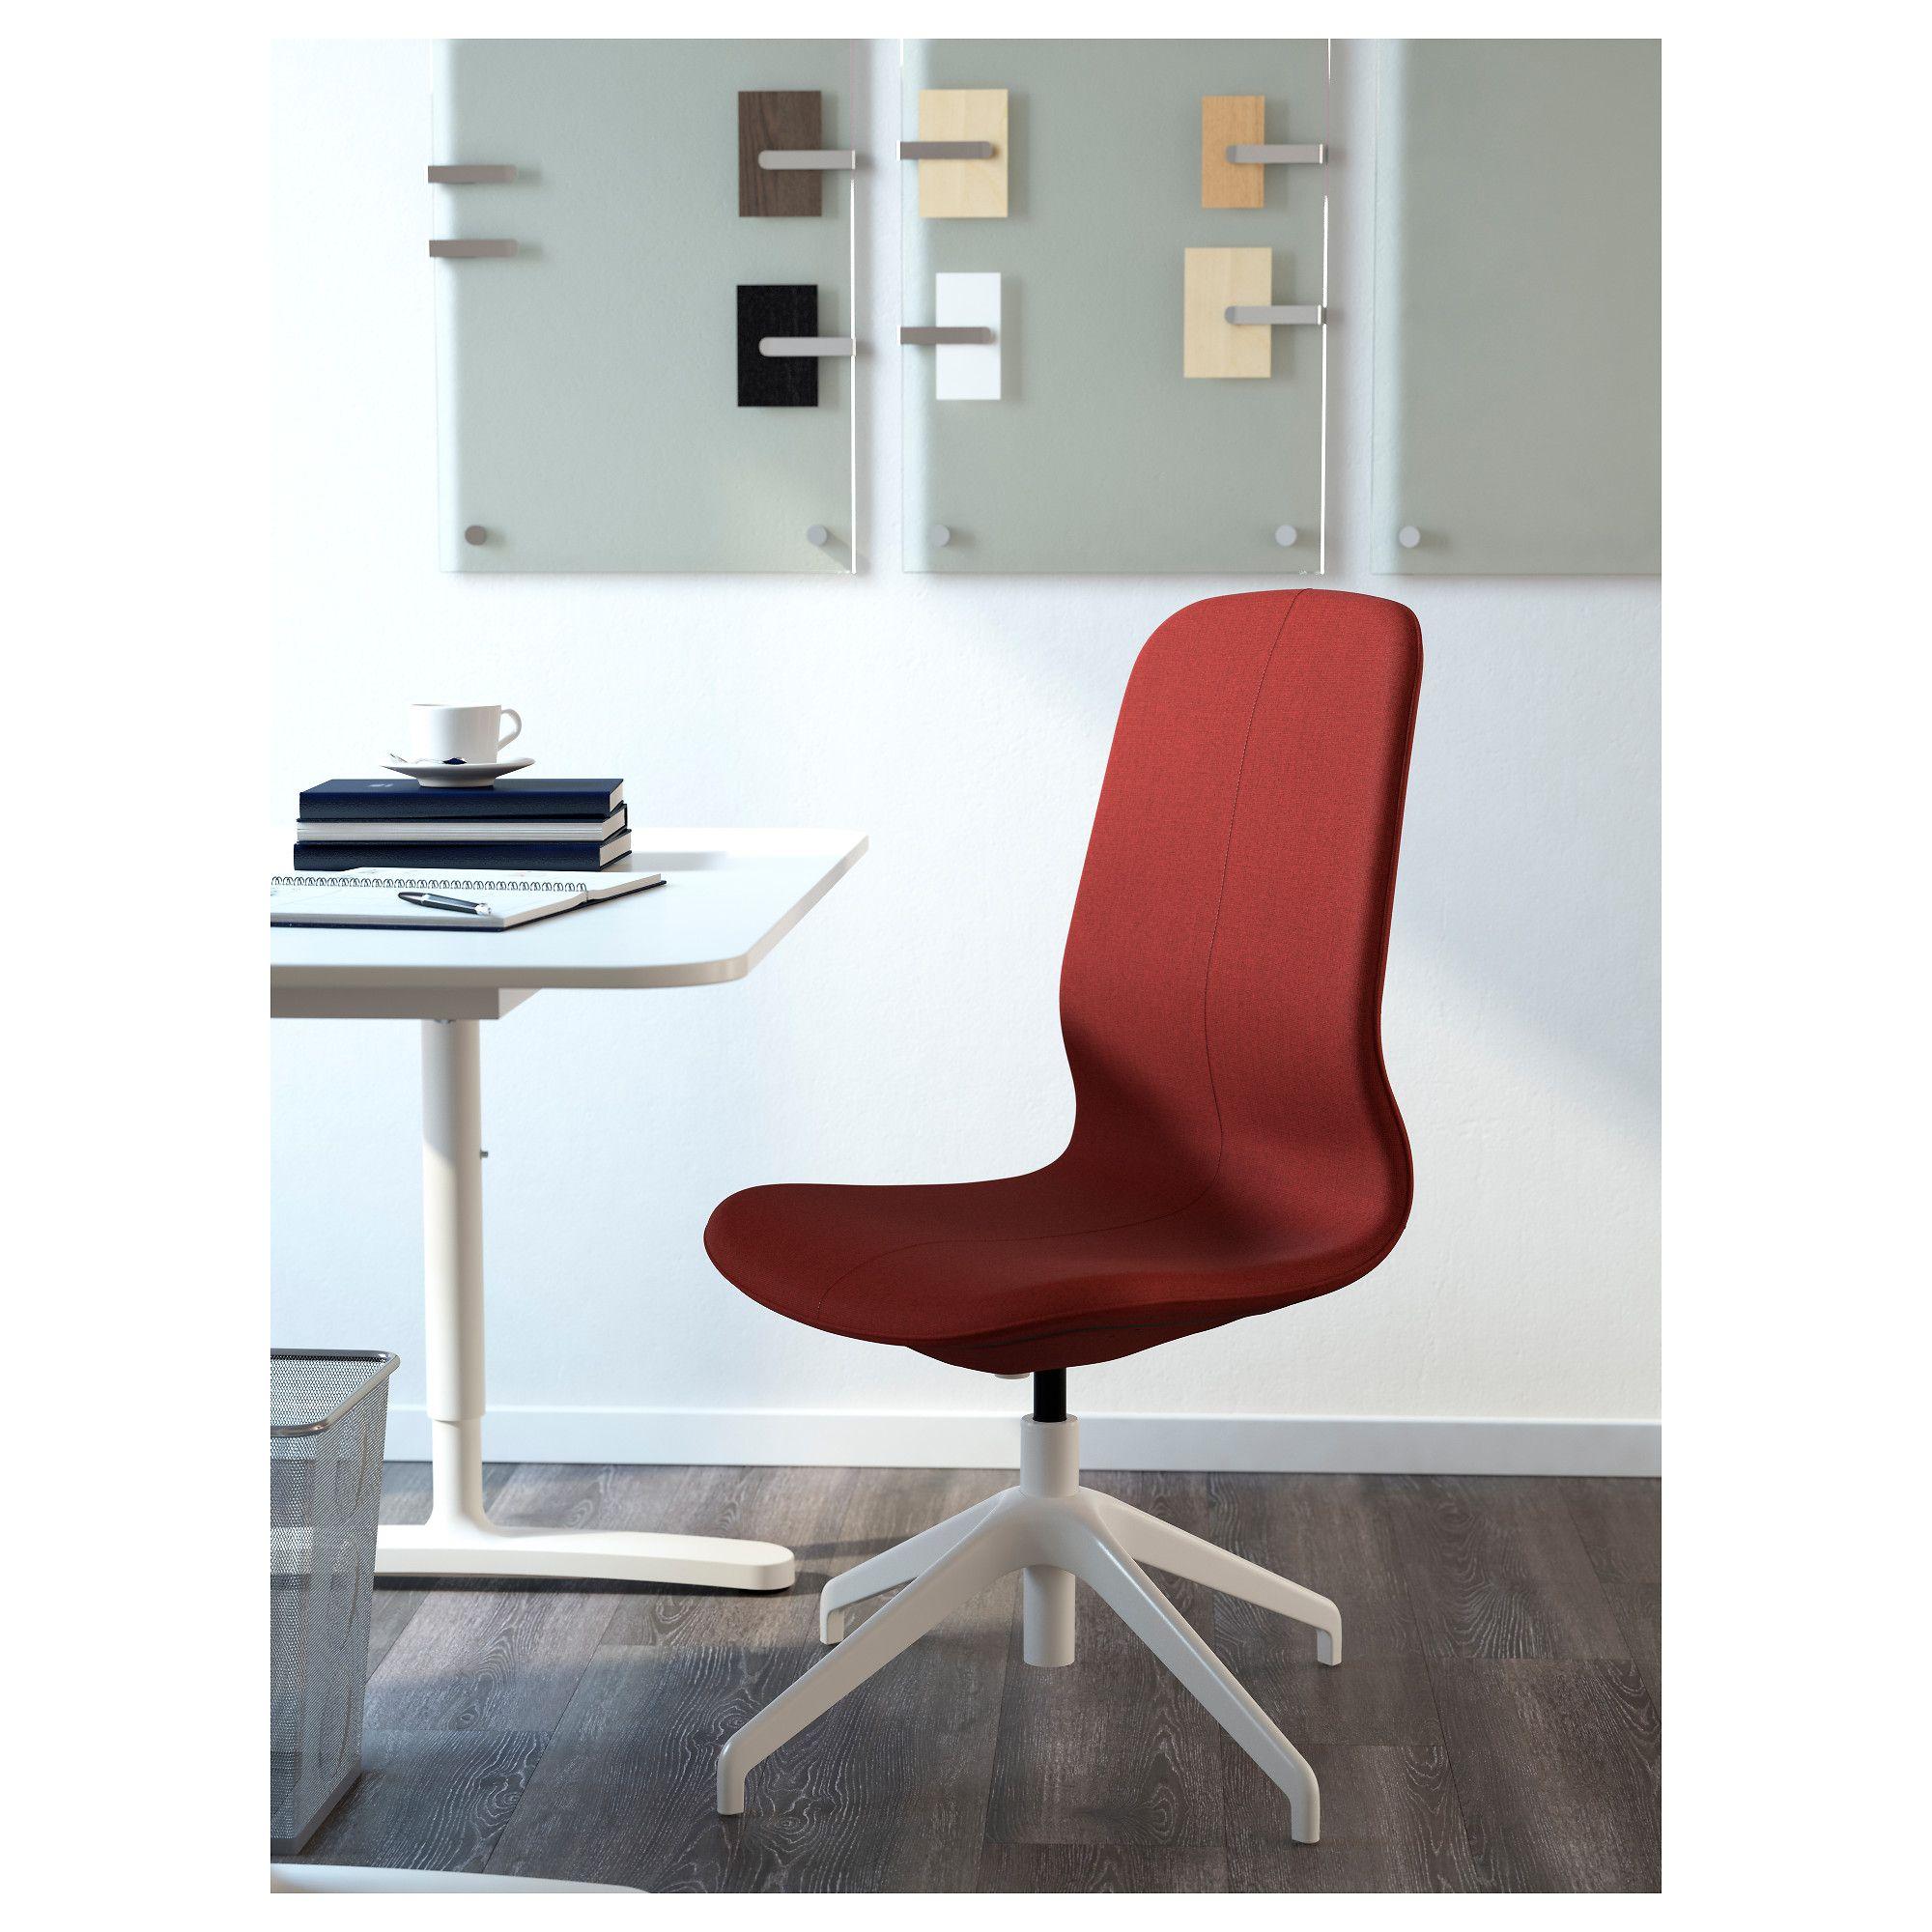 Furniture and Home Furnishings Furniture, Ikea office